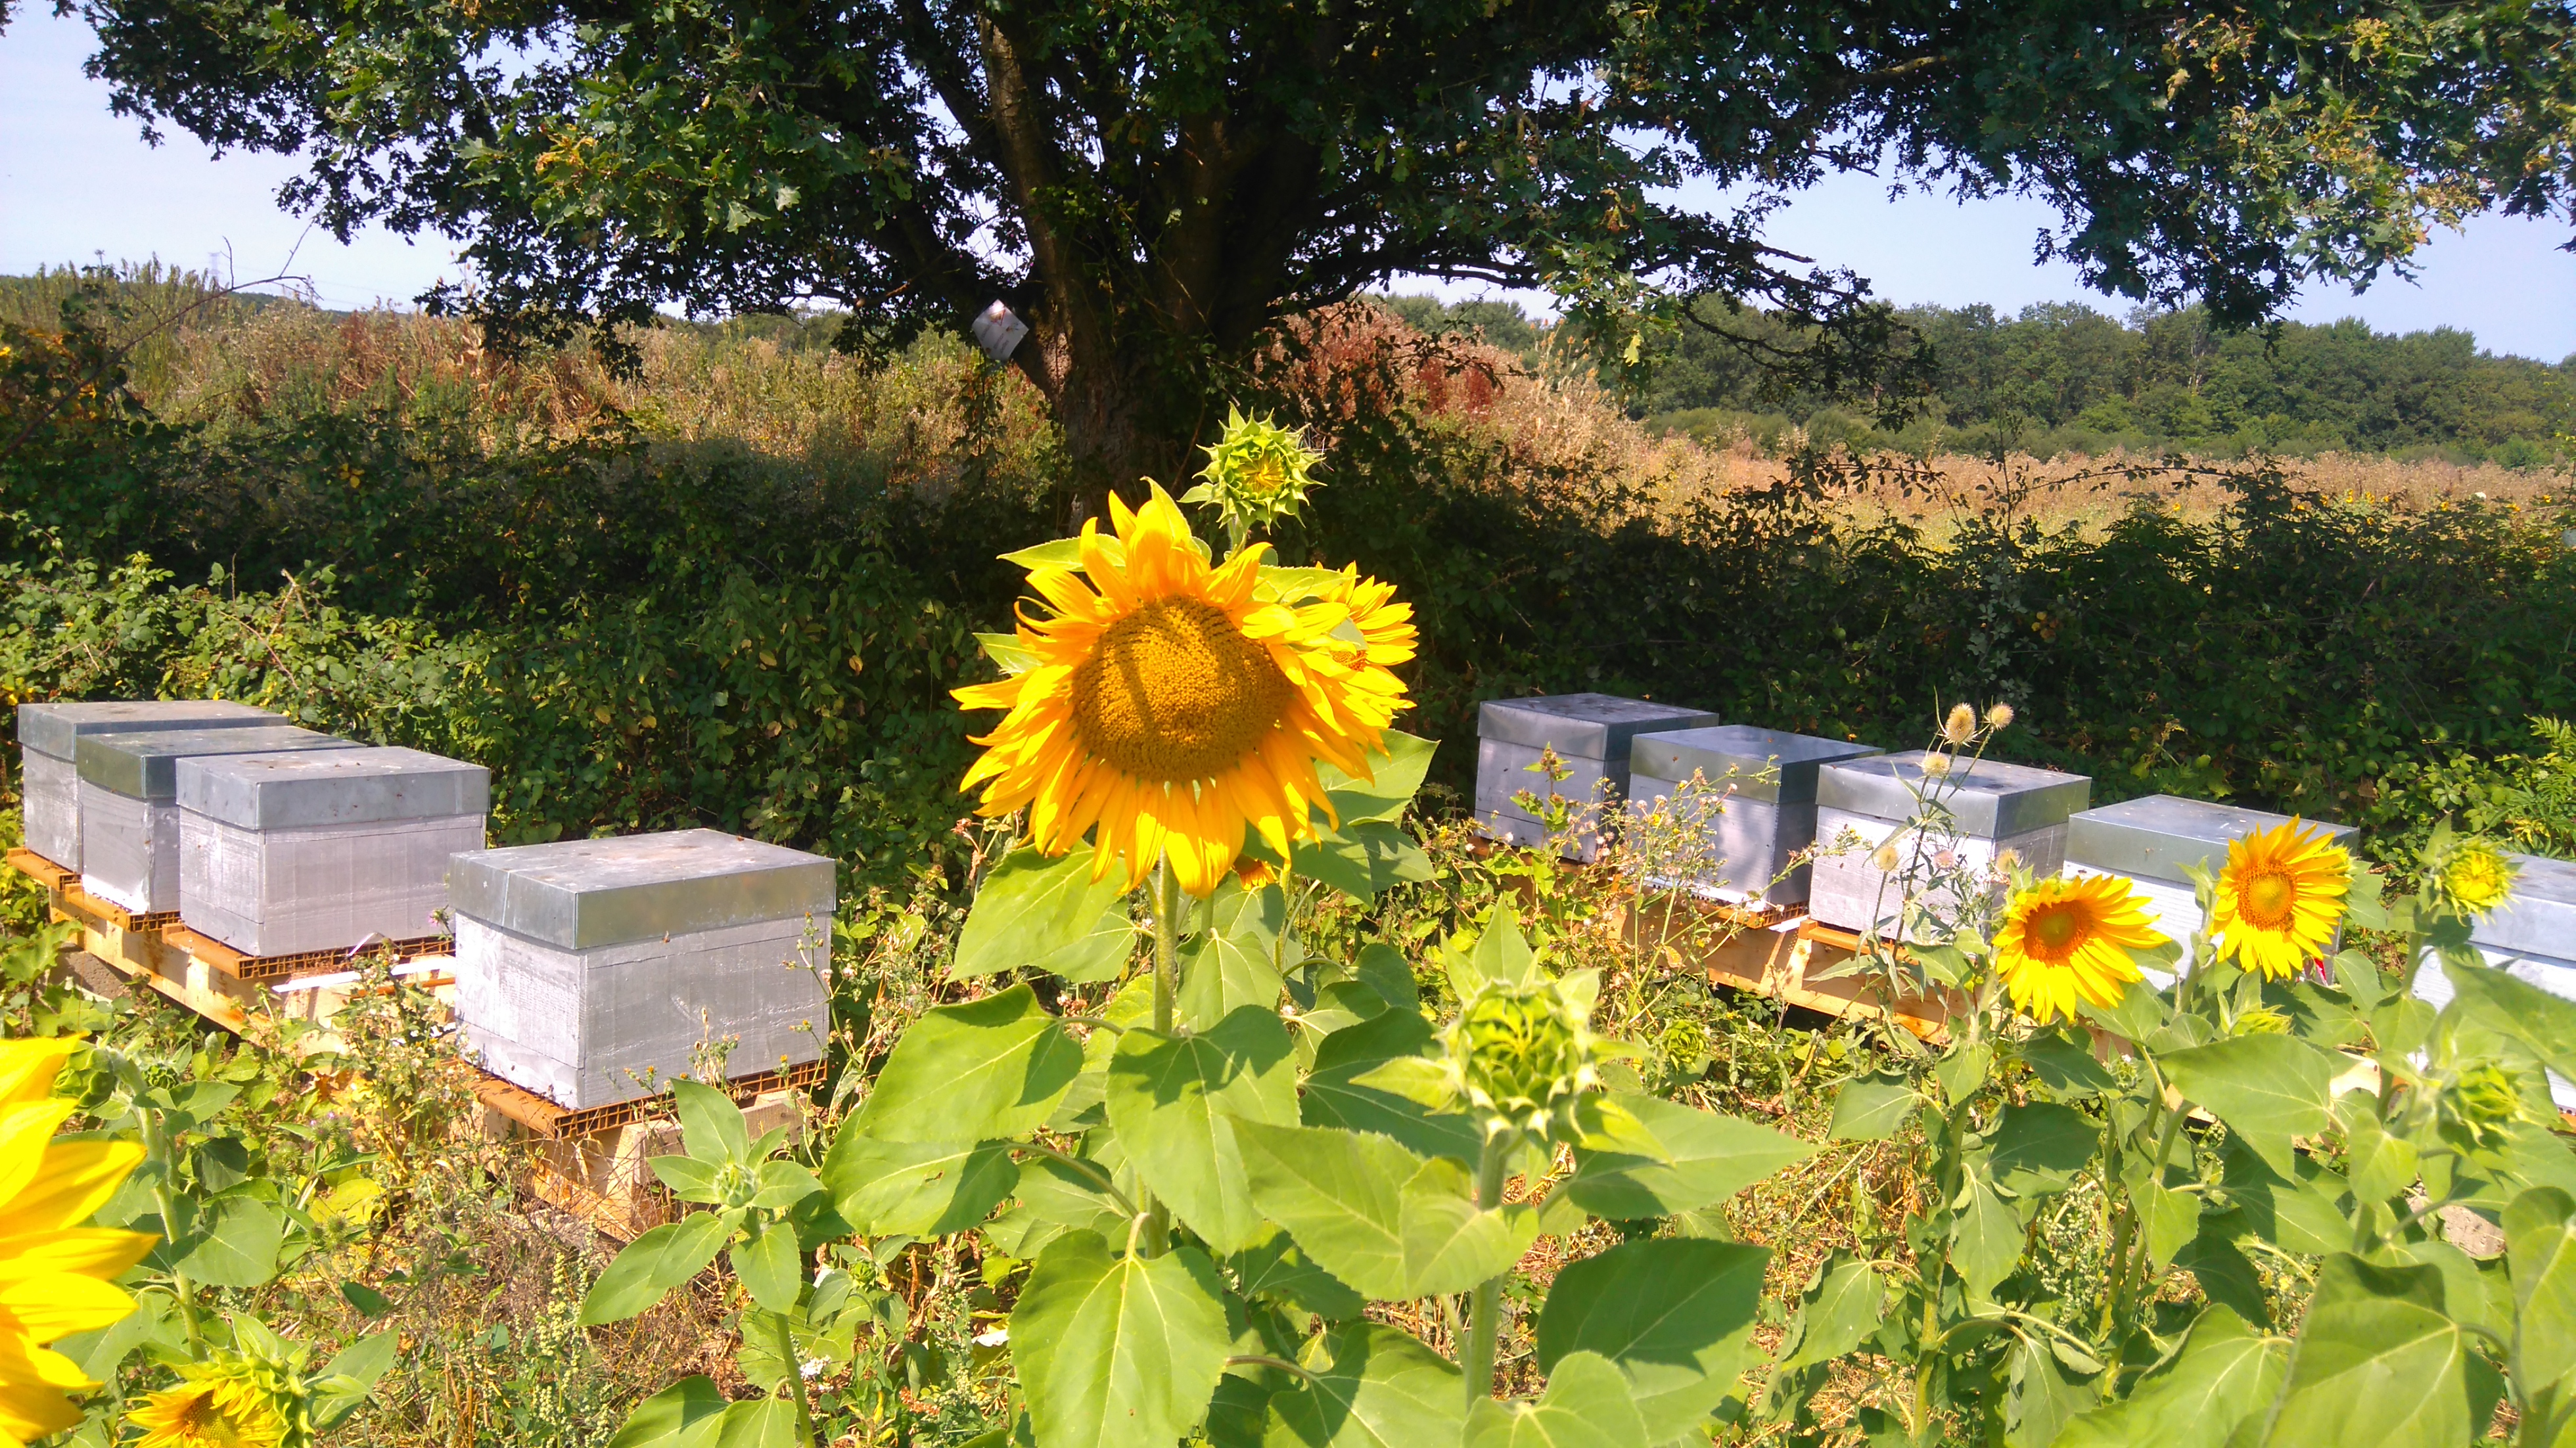 Nos premières installations de ruches